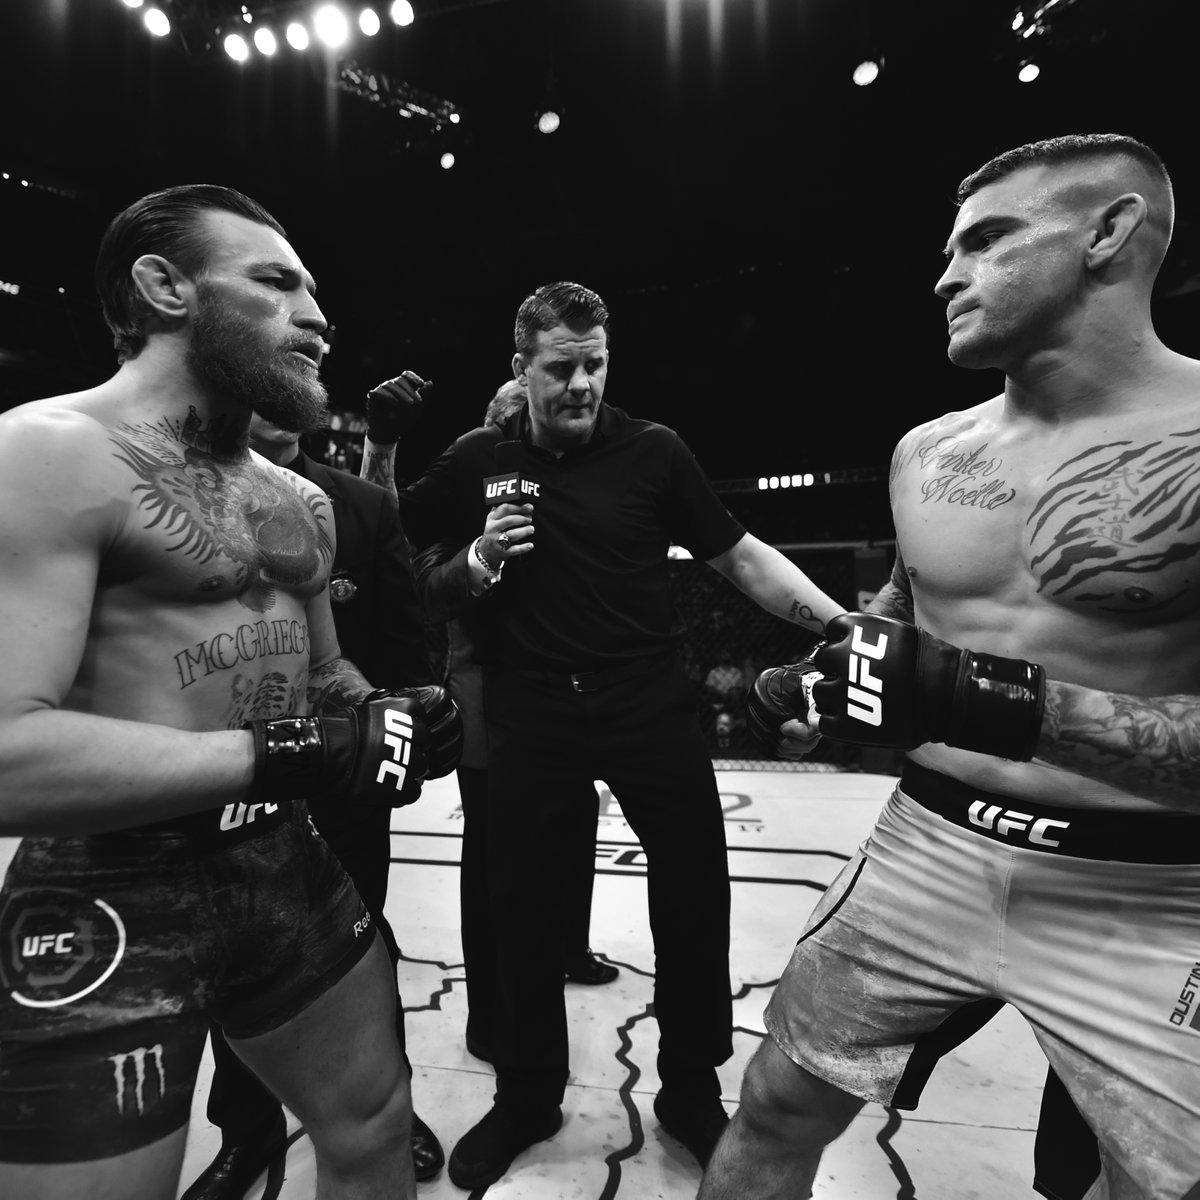 Cuales son tus pronósticos para esta revancha??? #UFC257 https://t.co/KSIERqeMFu